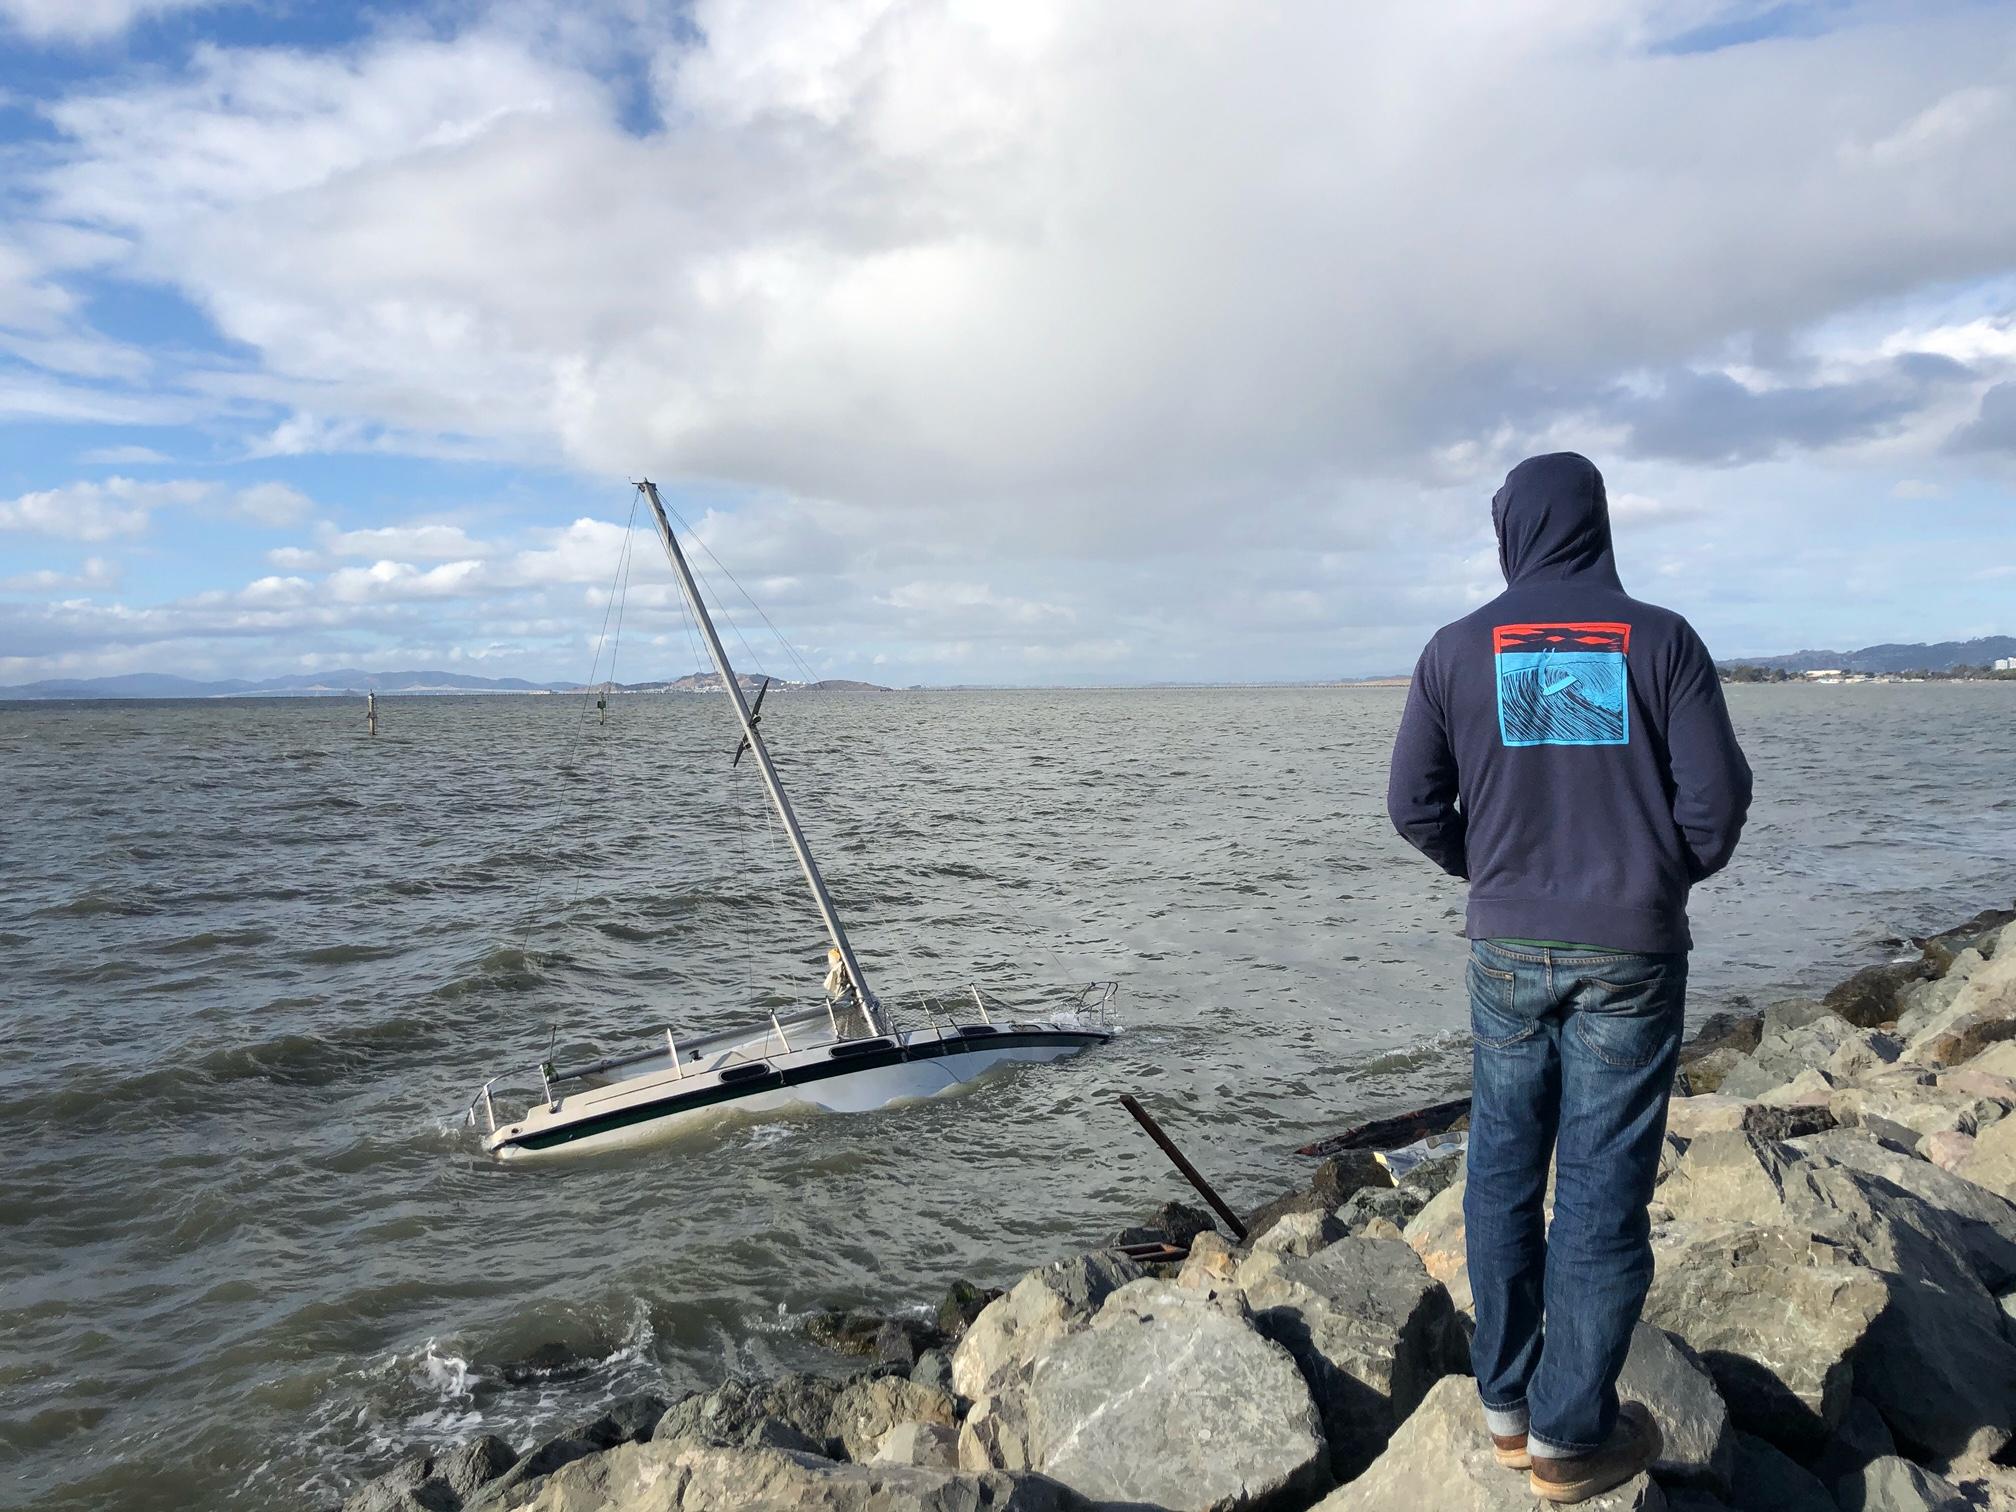 Rocks two, sailboats nil.